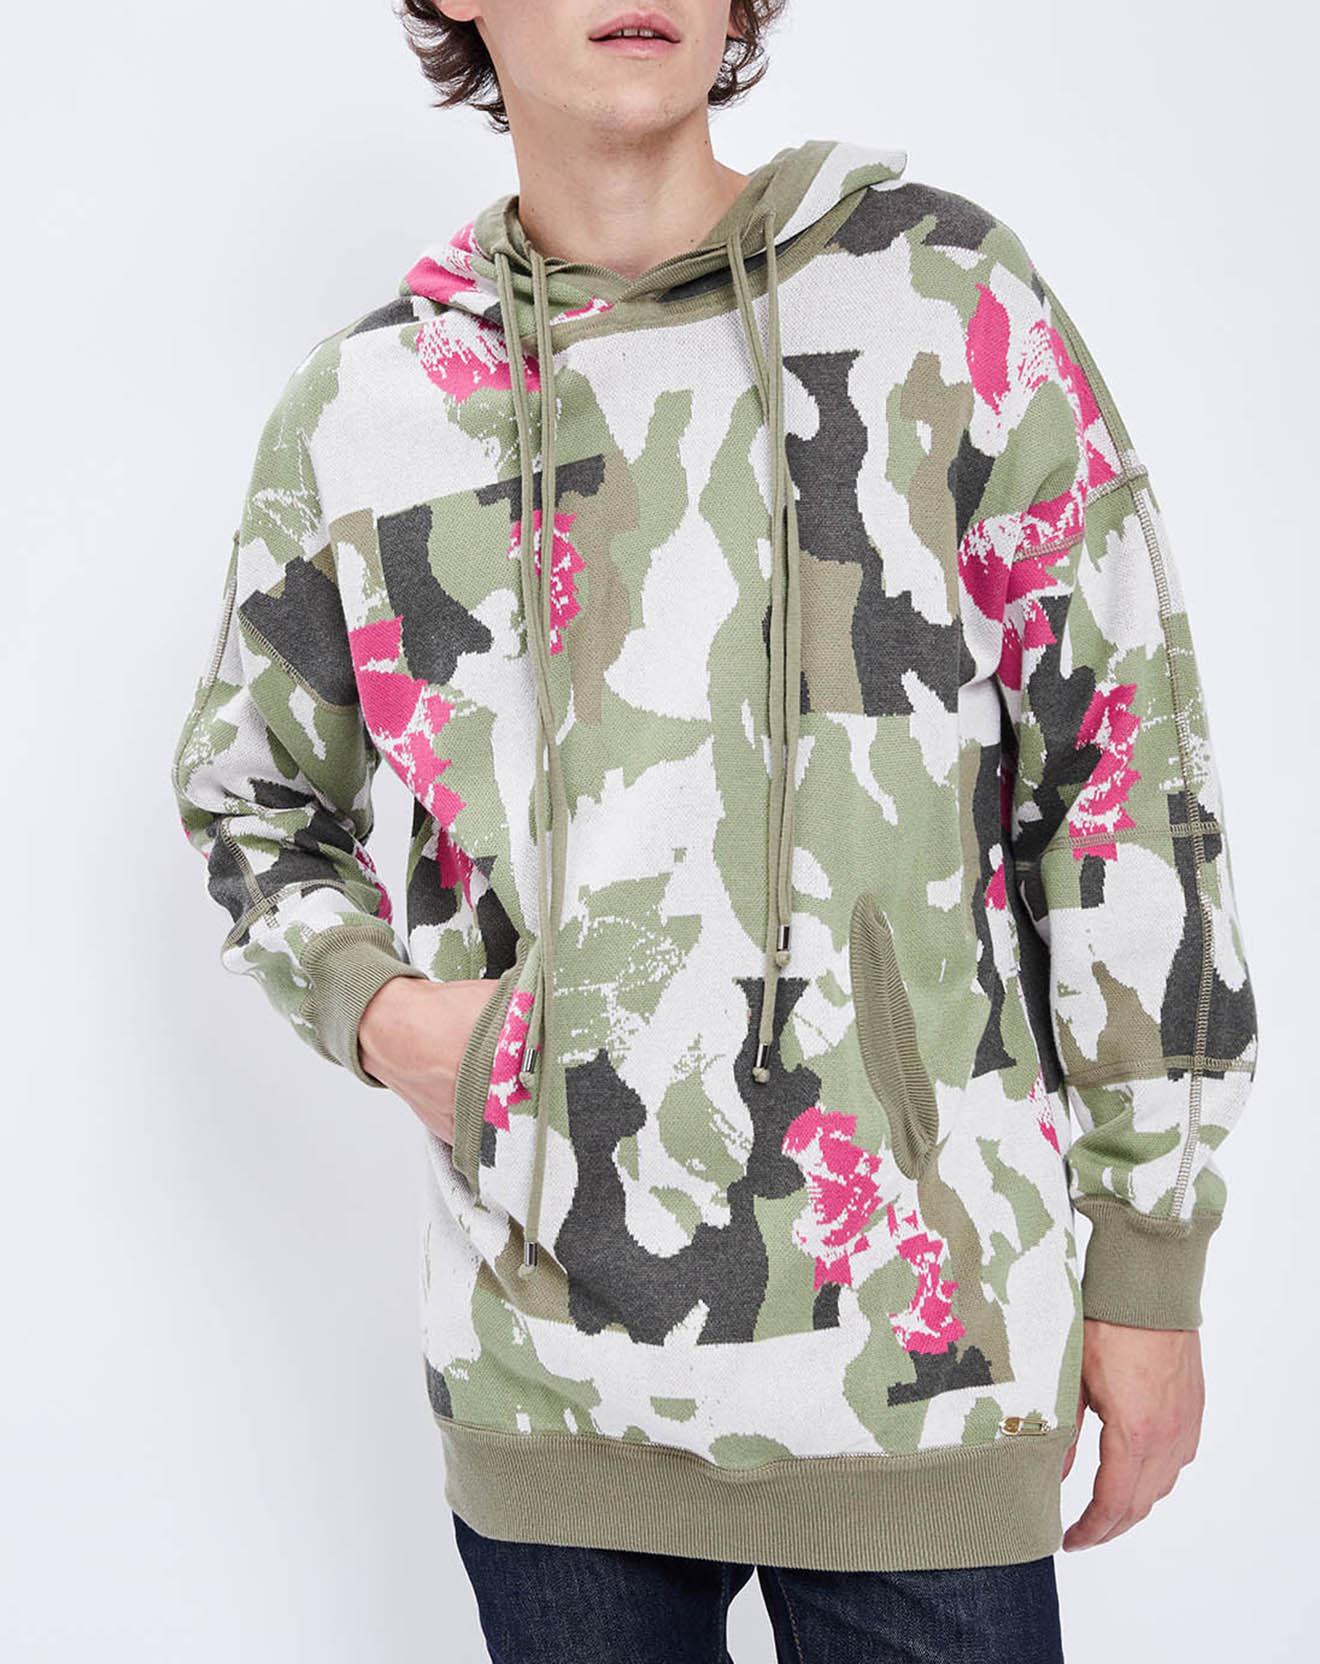 Sweat camouflage kaki/beige/rose - John Galliano - Modalova